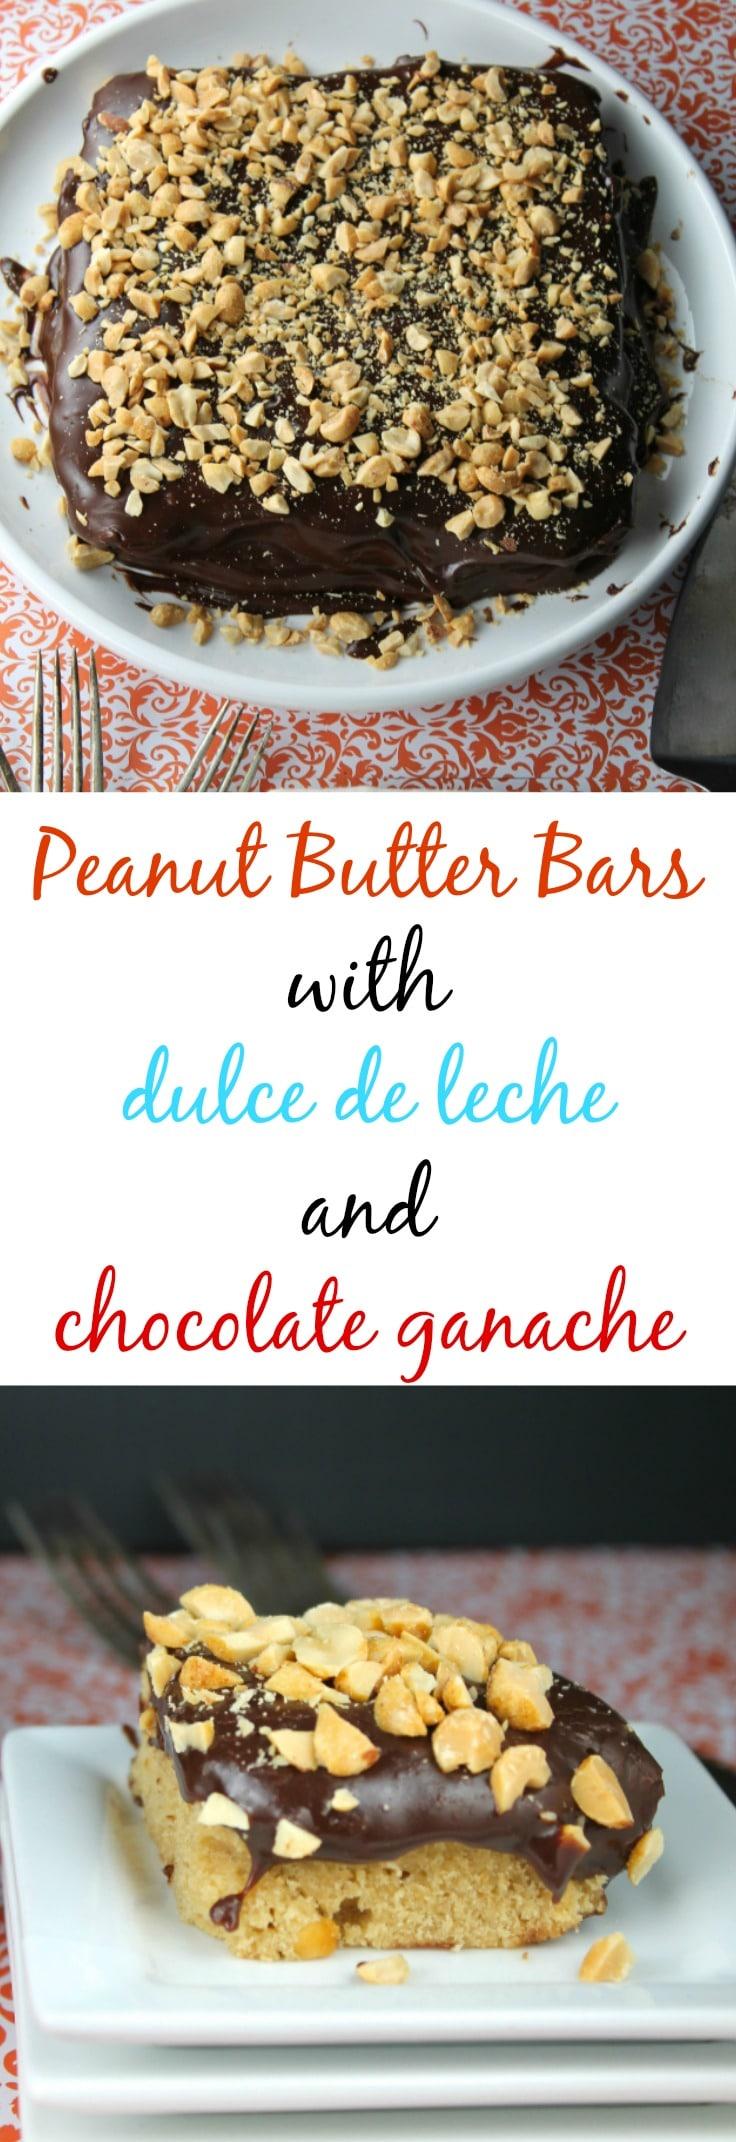 Peanut Butter Bars with dulce de leche and chocolate ganache  Recipe found at missinthektichen.com